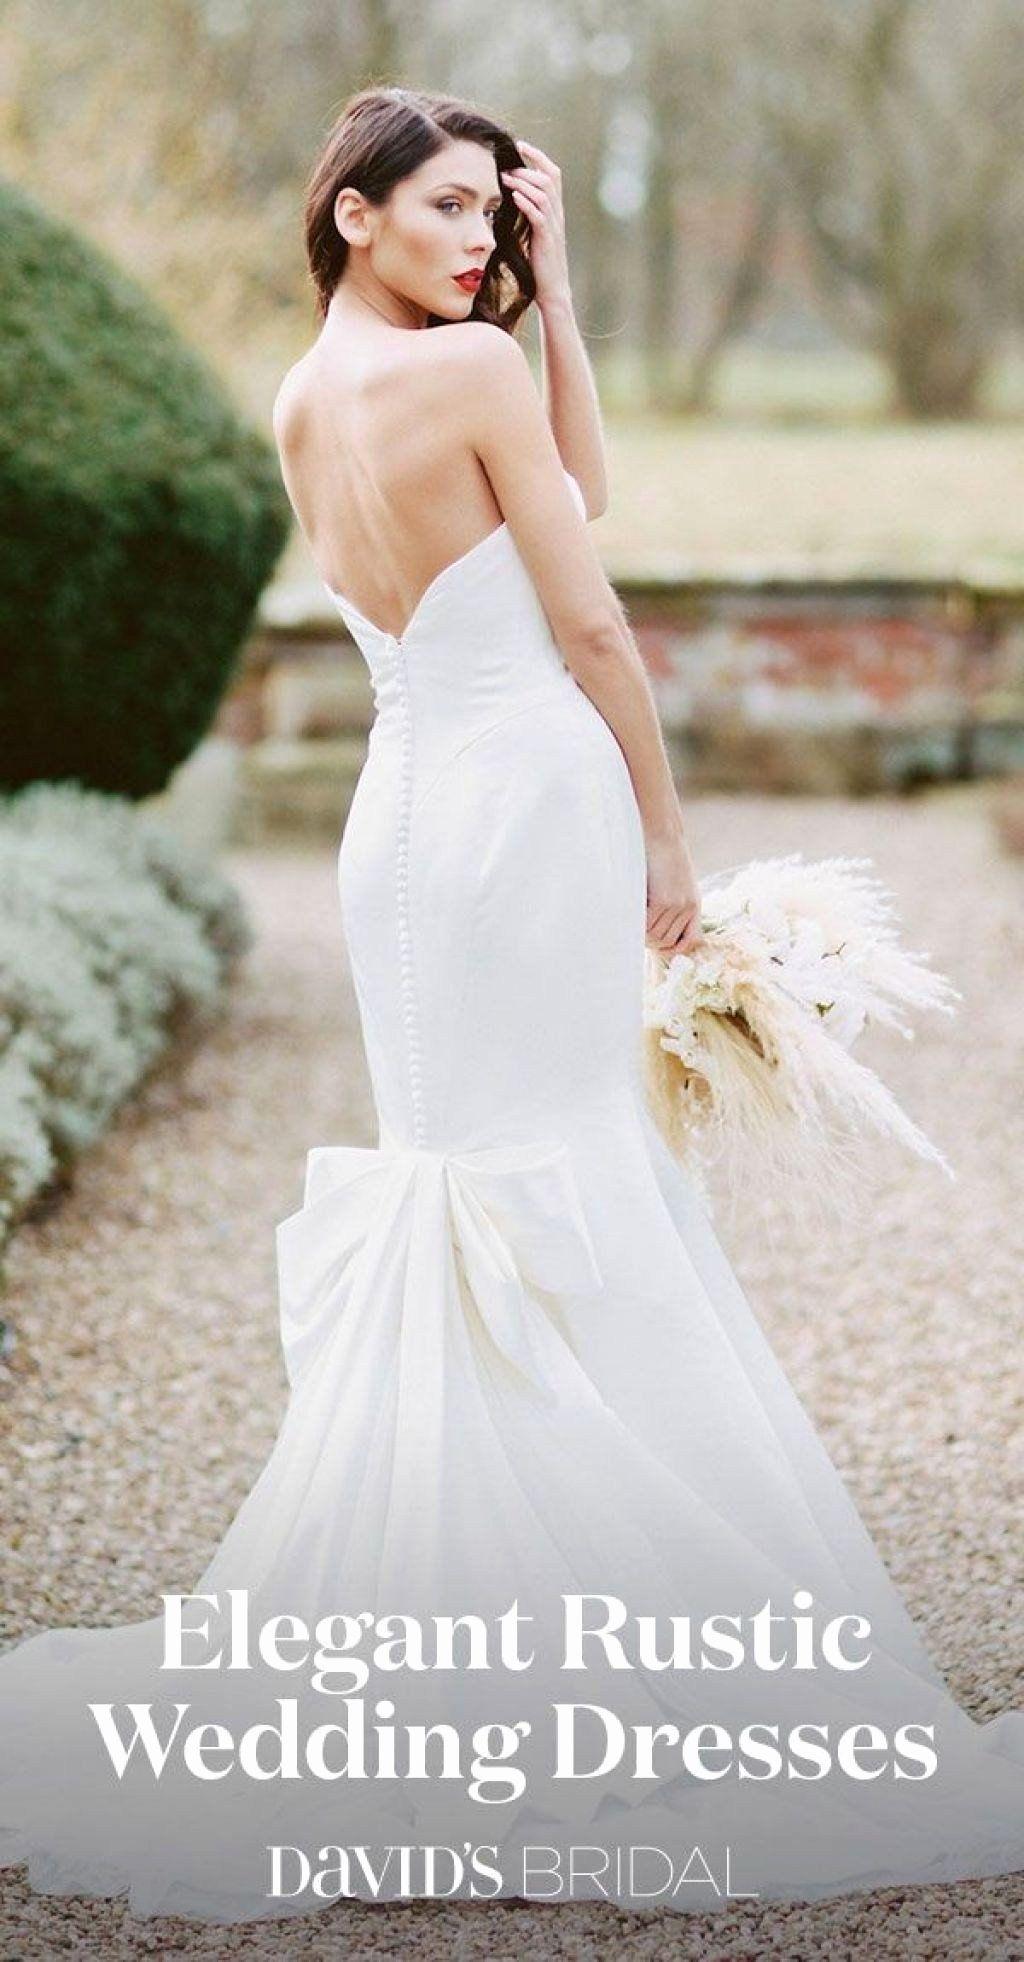 Wedding Dress Jacksonville Fl Fresh 25 Beautiful Wedding Dress Stylish In 2020 Modest Bridal Gowns Wedding Dress Websites Rustic Wedding Dresses